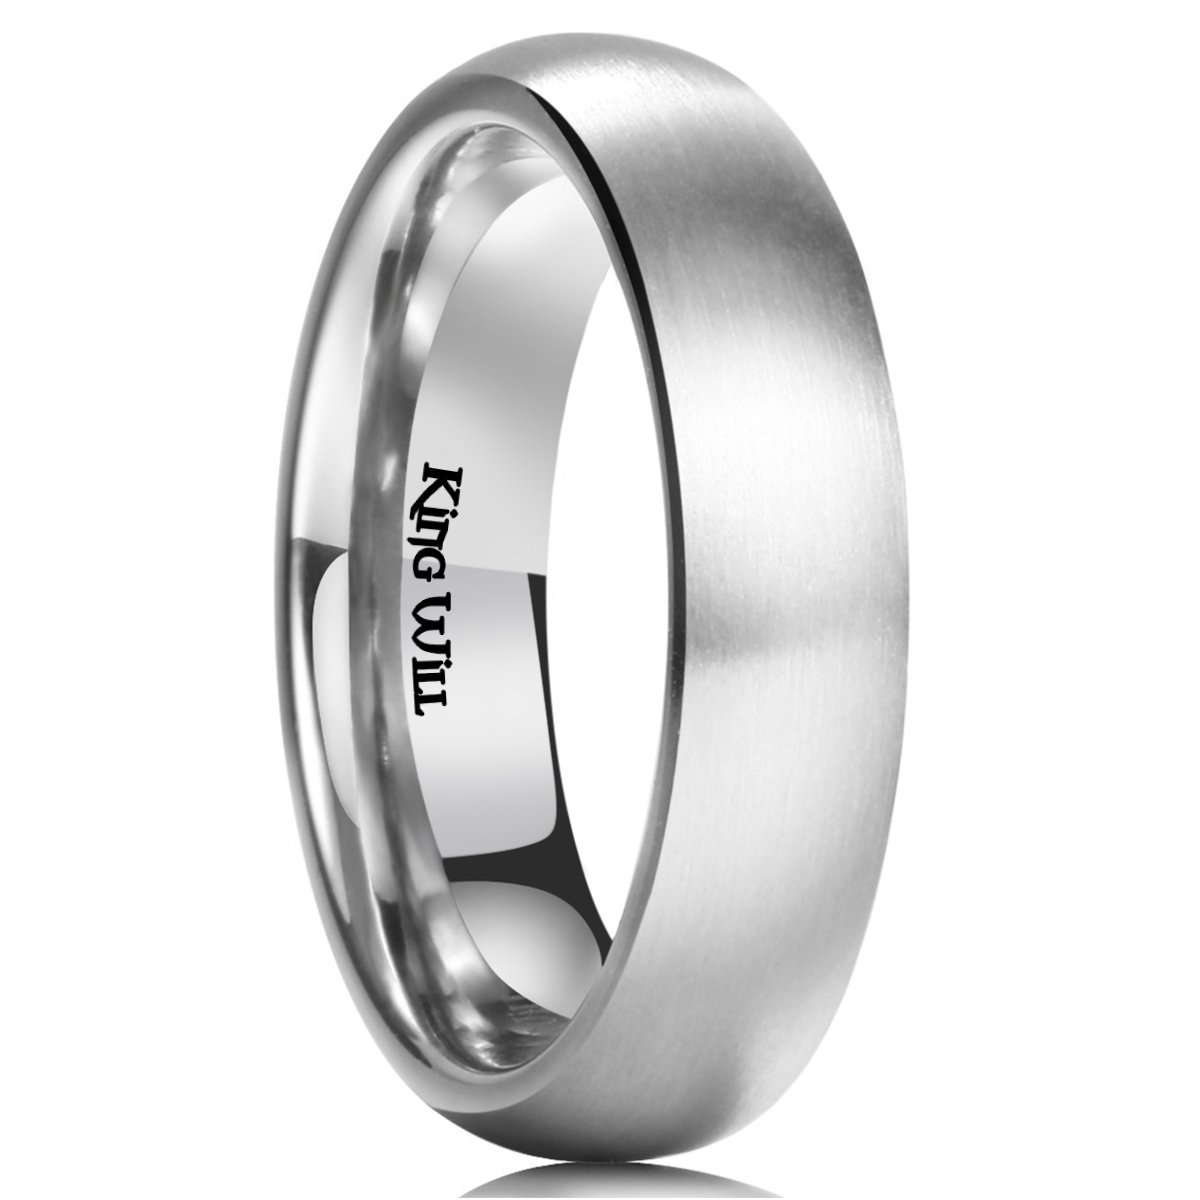 King Will Basic 5MM Titanium Ring Brushed/Matte Comfort Fit Wedding Band for Men 8